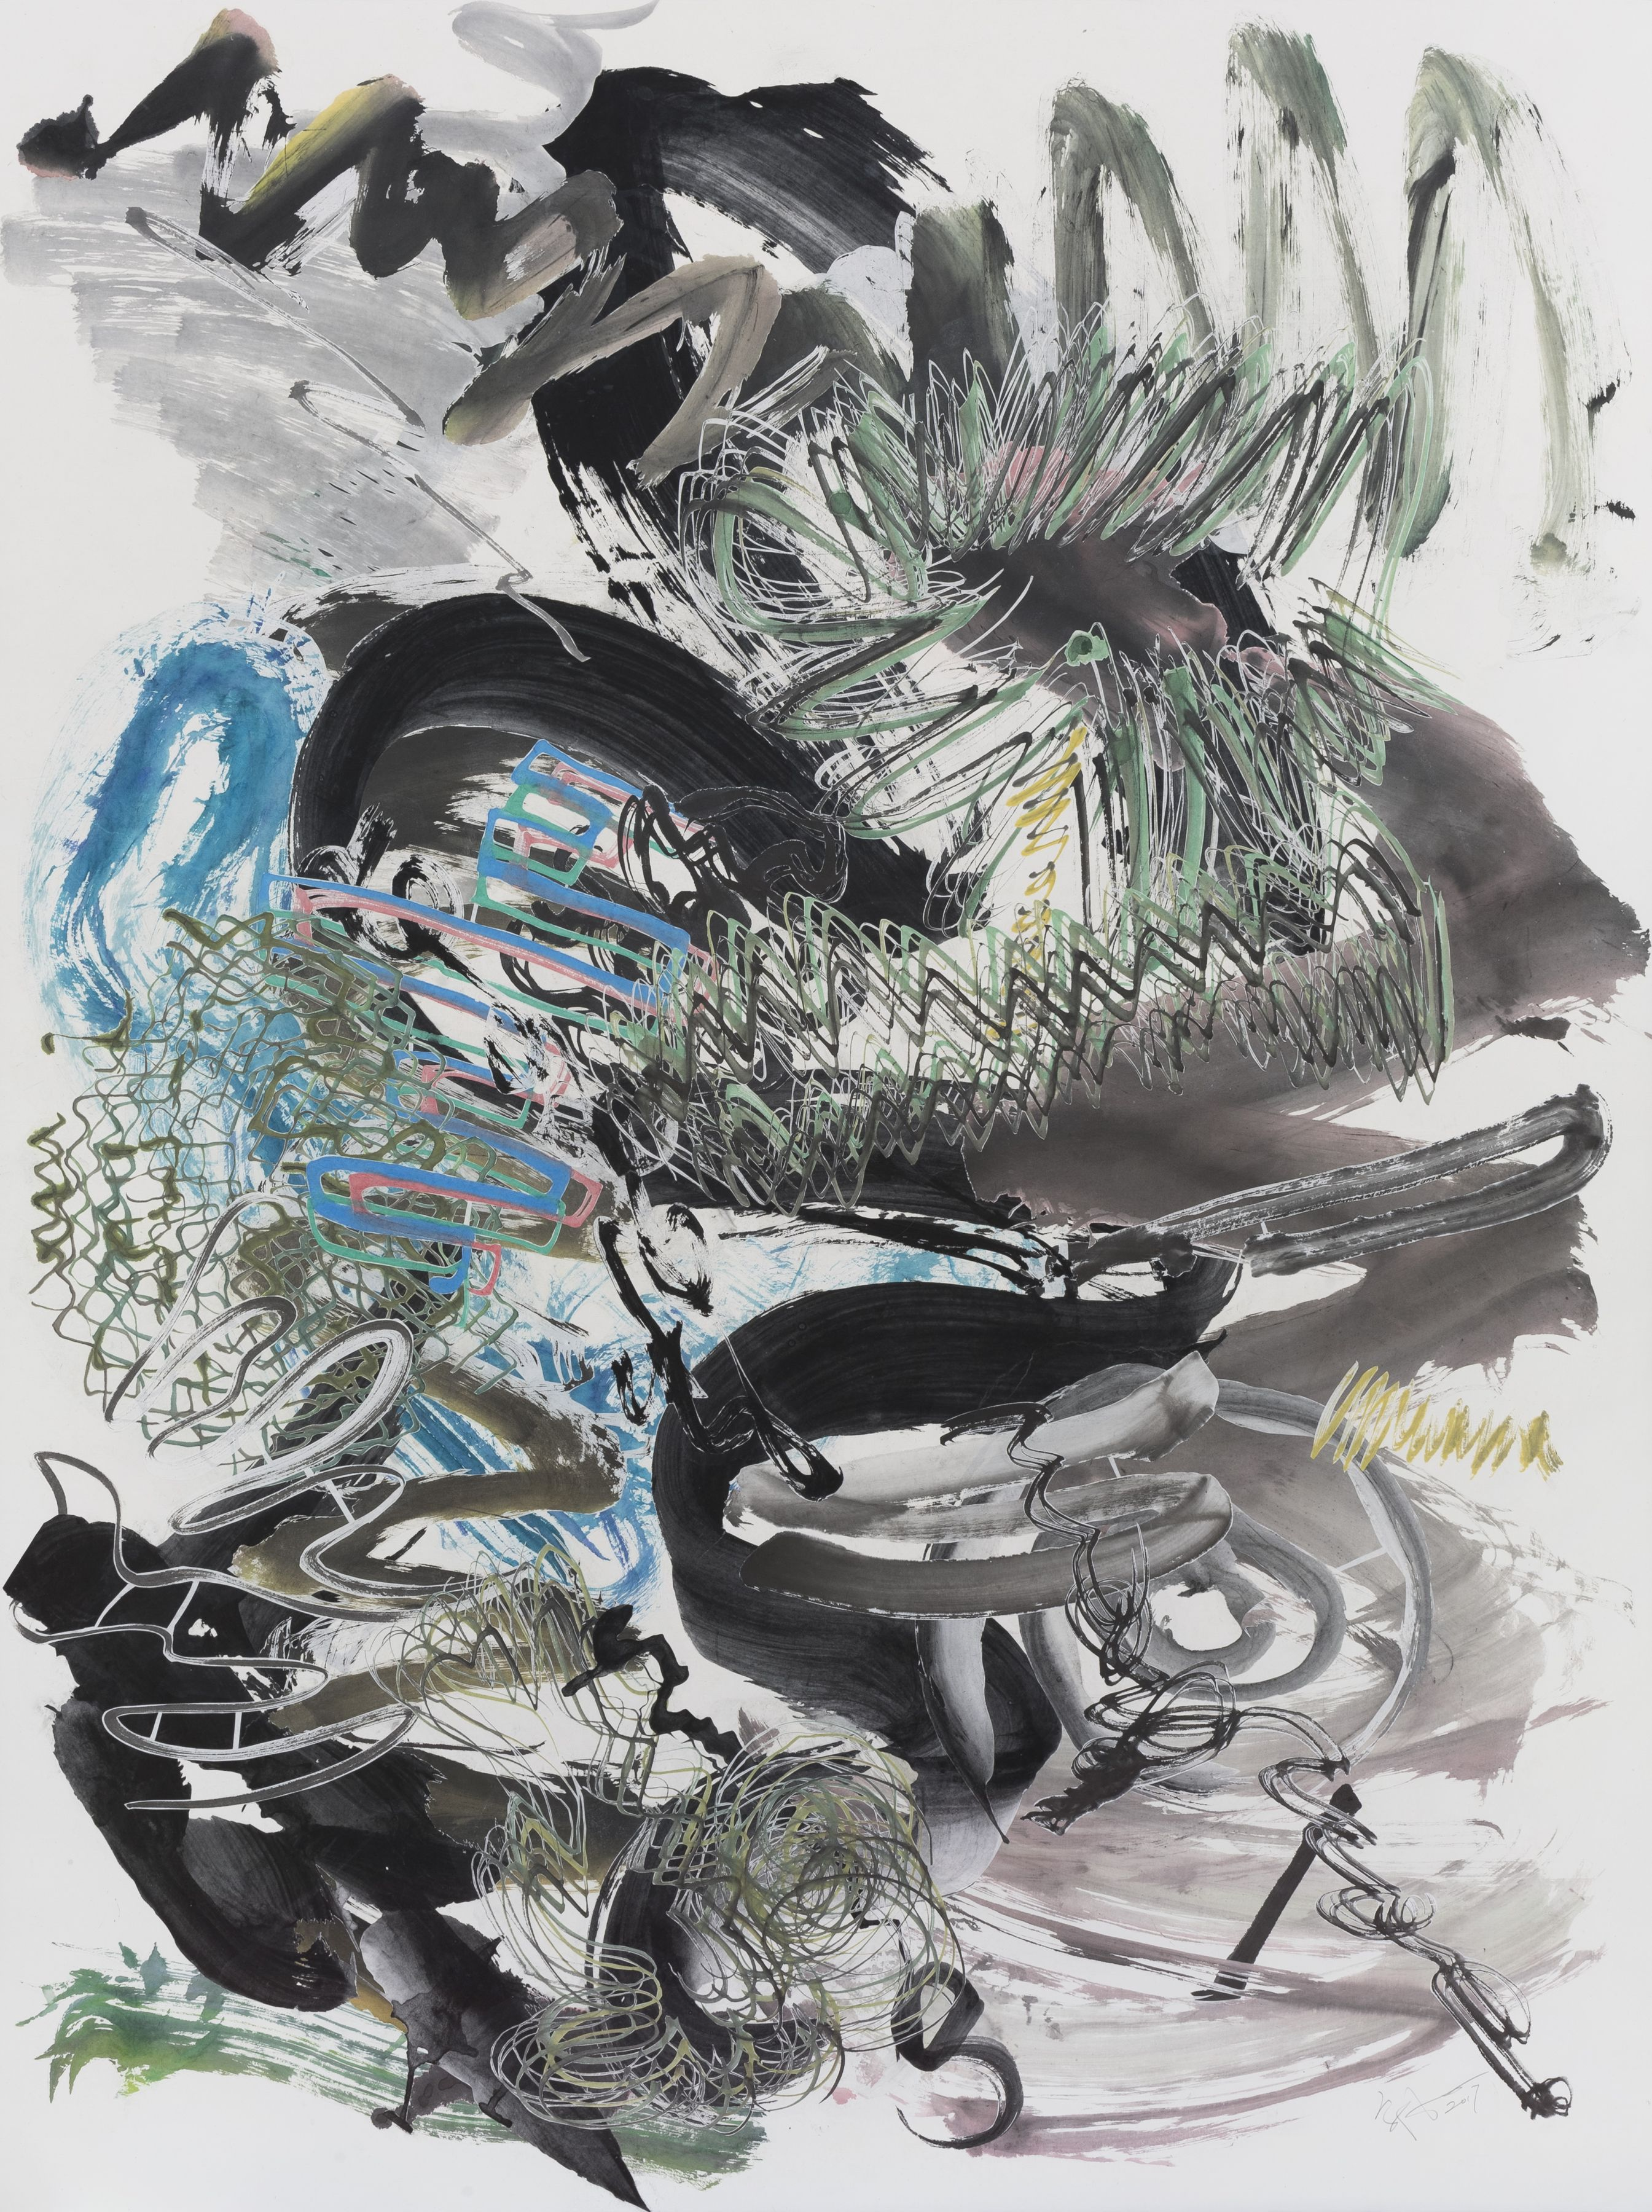 Wu Jian'an 邬建安 (b. 1980), 500 Brushstrokes #19 五百笔 #19